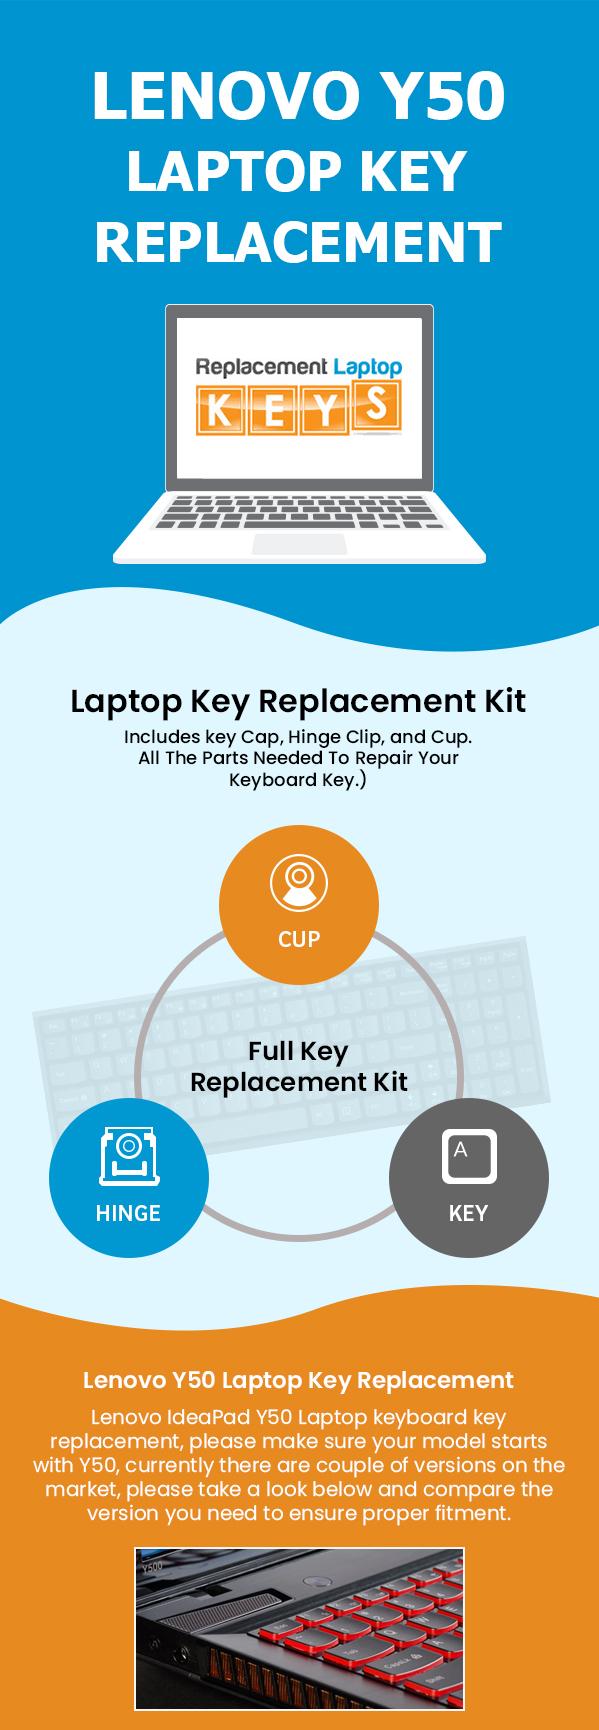 Buy Original Lenovo Y50 Laptop Replacement Keys from Replacement Laptop Keys